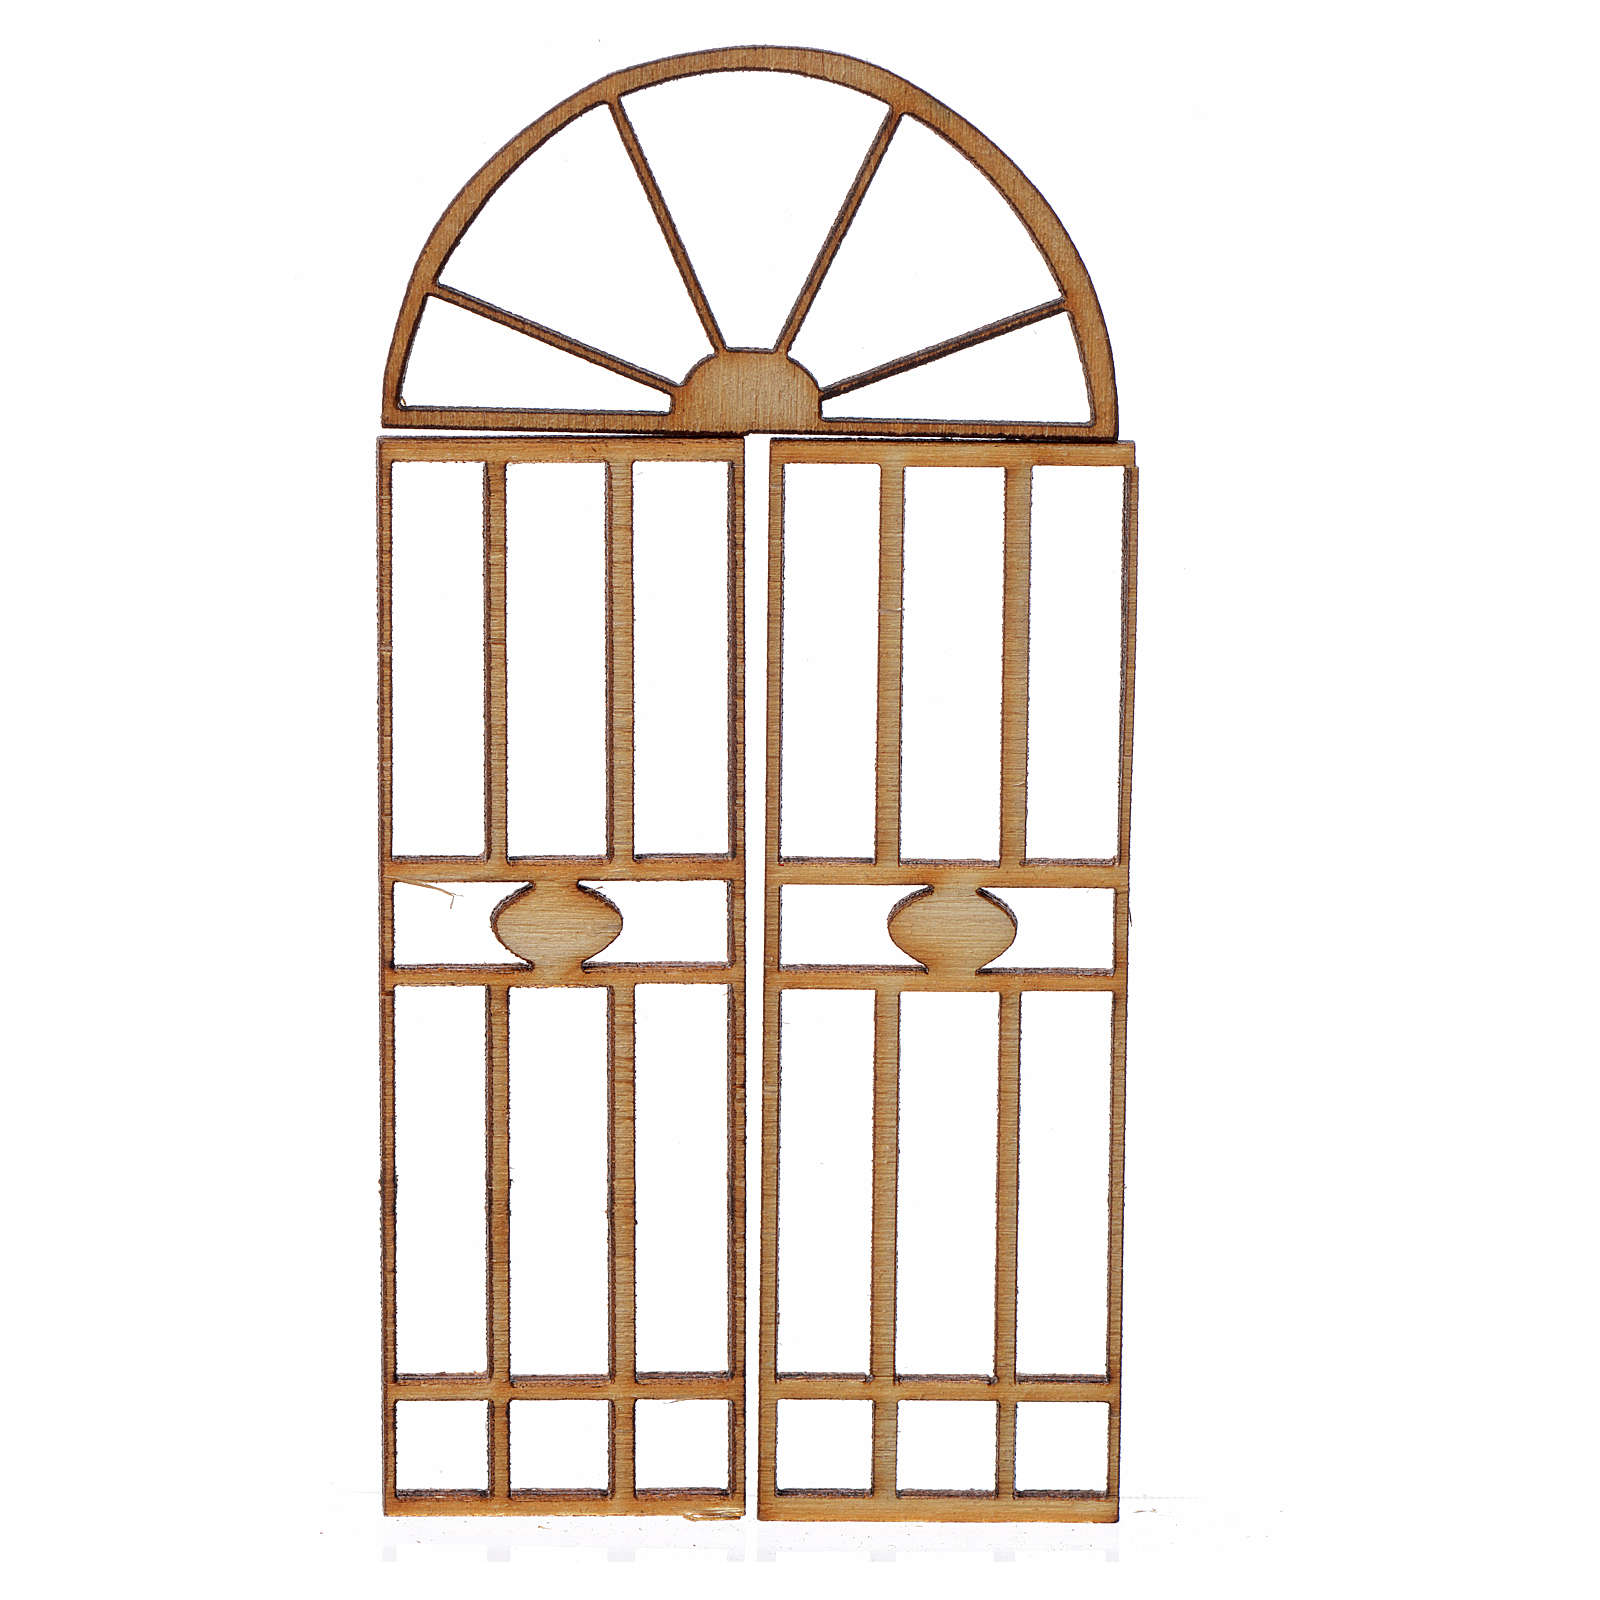 Portón belén madera 3 piezas 7x3,5 cm 4